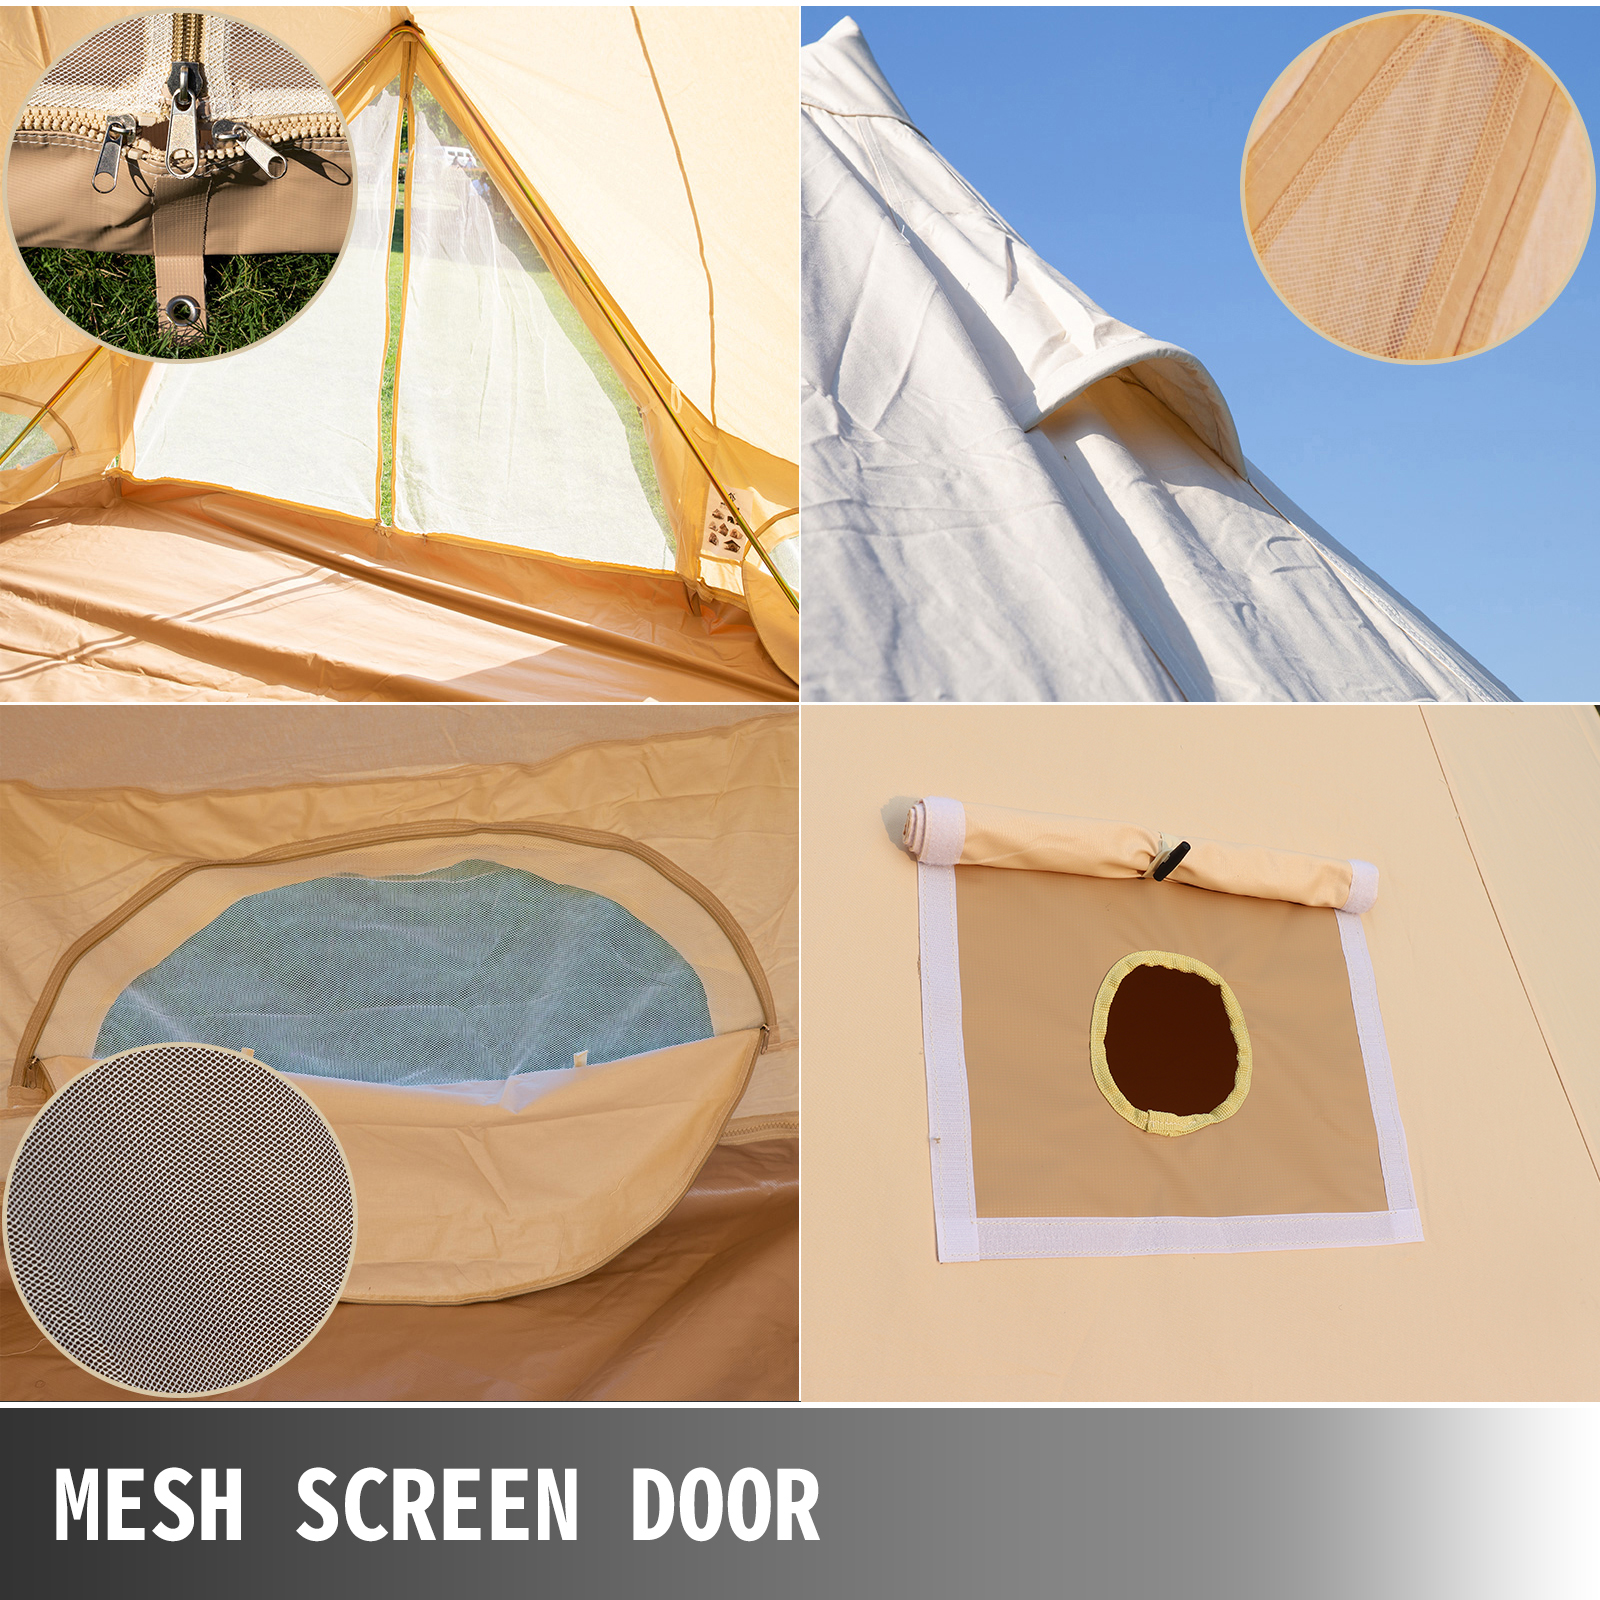 4-Season-Bell-Tent-3-4-5-6M-Waterproof-Cotton-Canvas-Glamping-Camping-Beach-US thumbnail 15